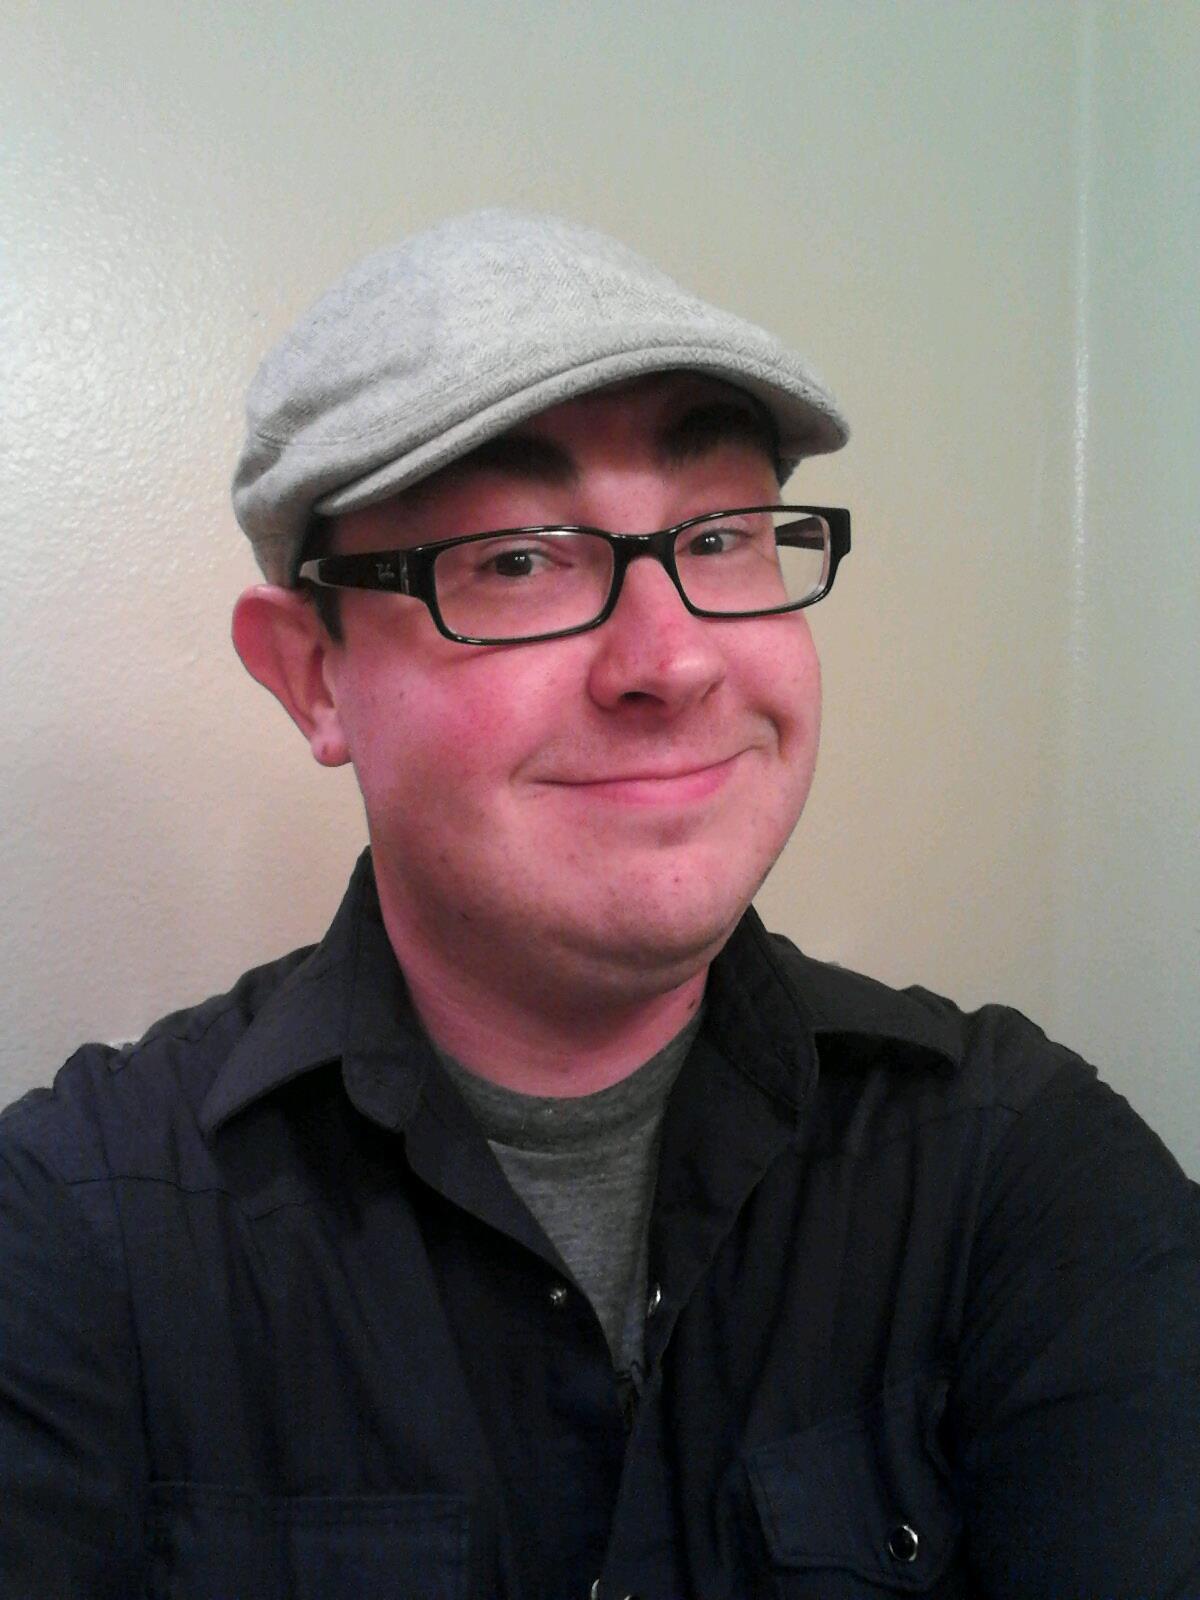 Shawn Montgomery (circa 2012)